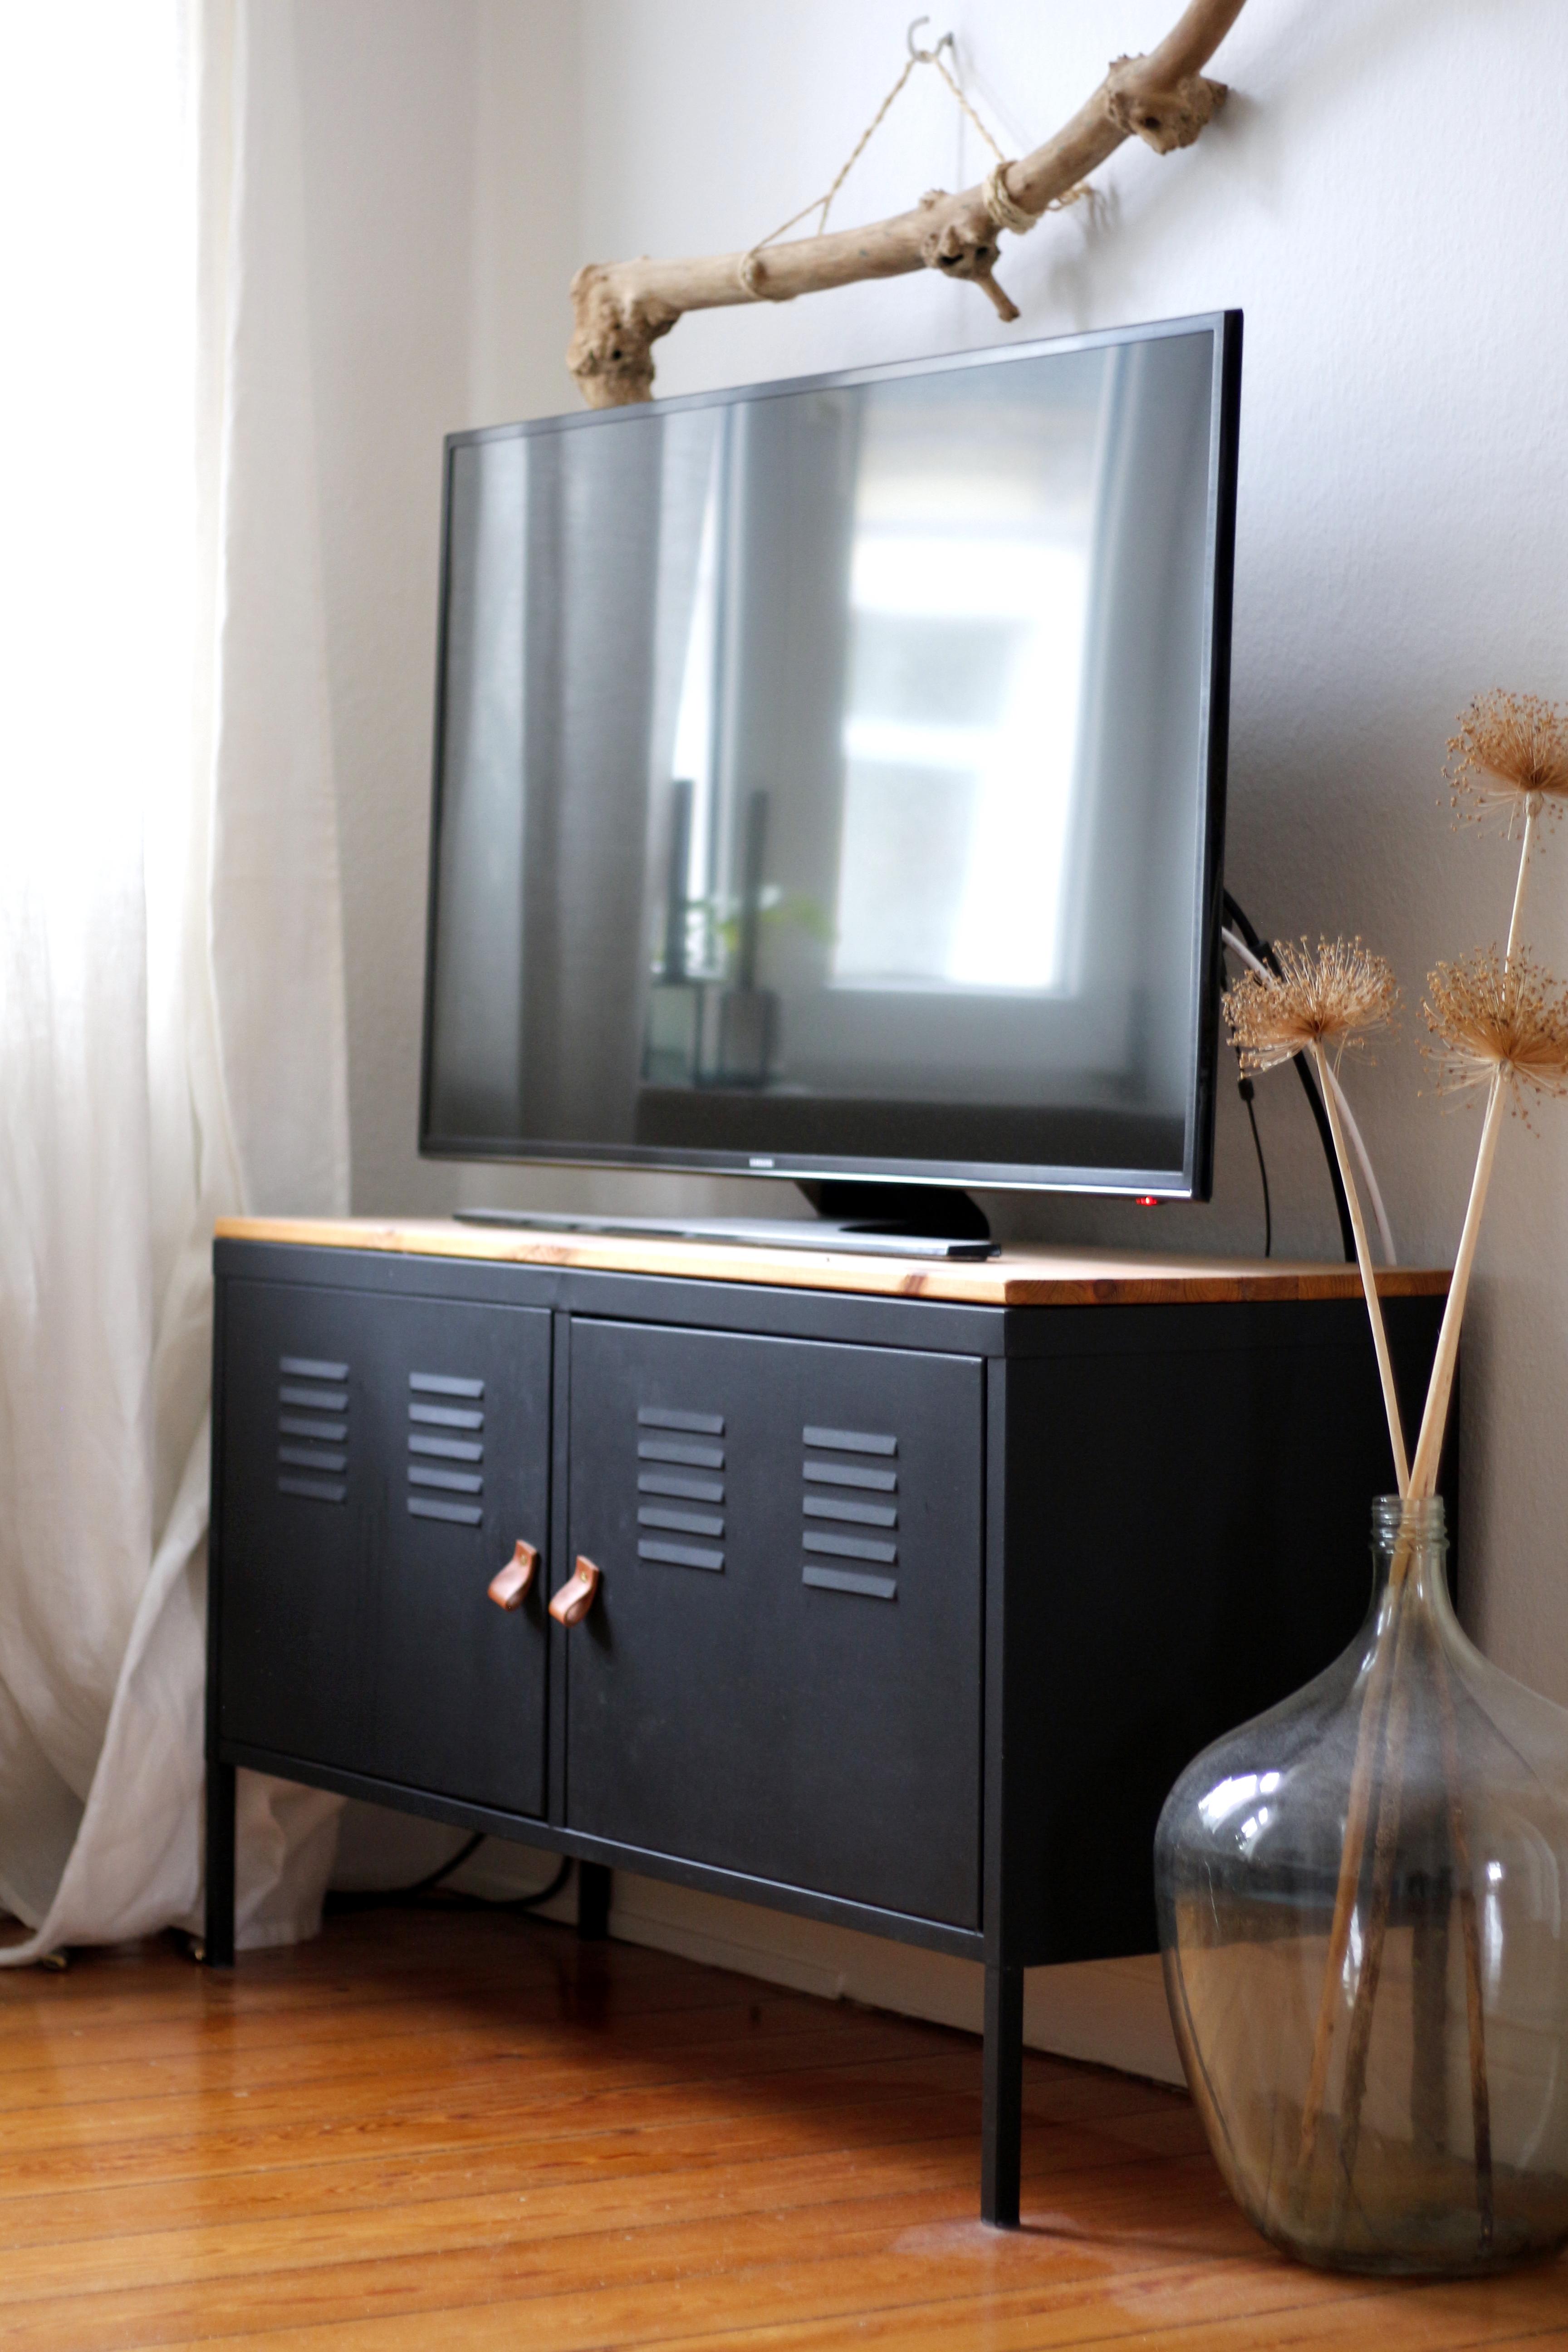 ikea couchtisch pimpen ligne roset couchtisch. Black Bedroom Furniture Sets. Home Design Ideas